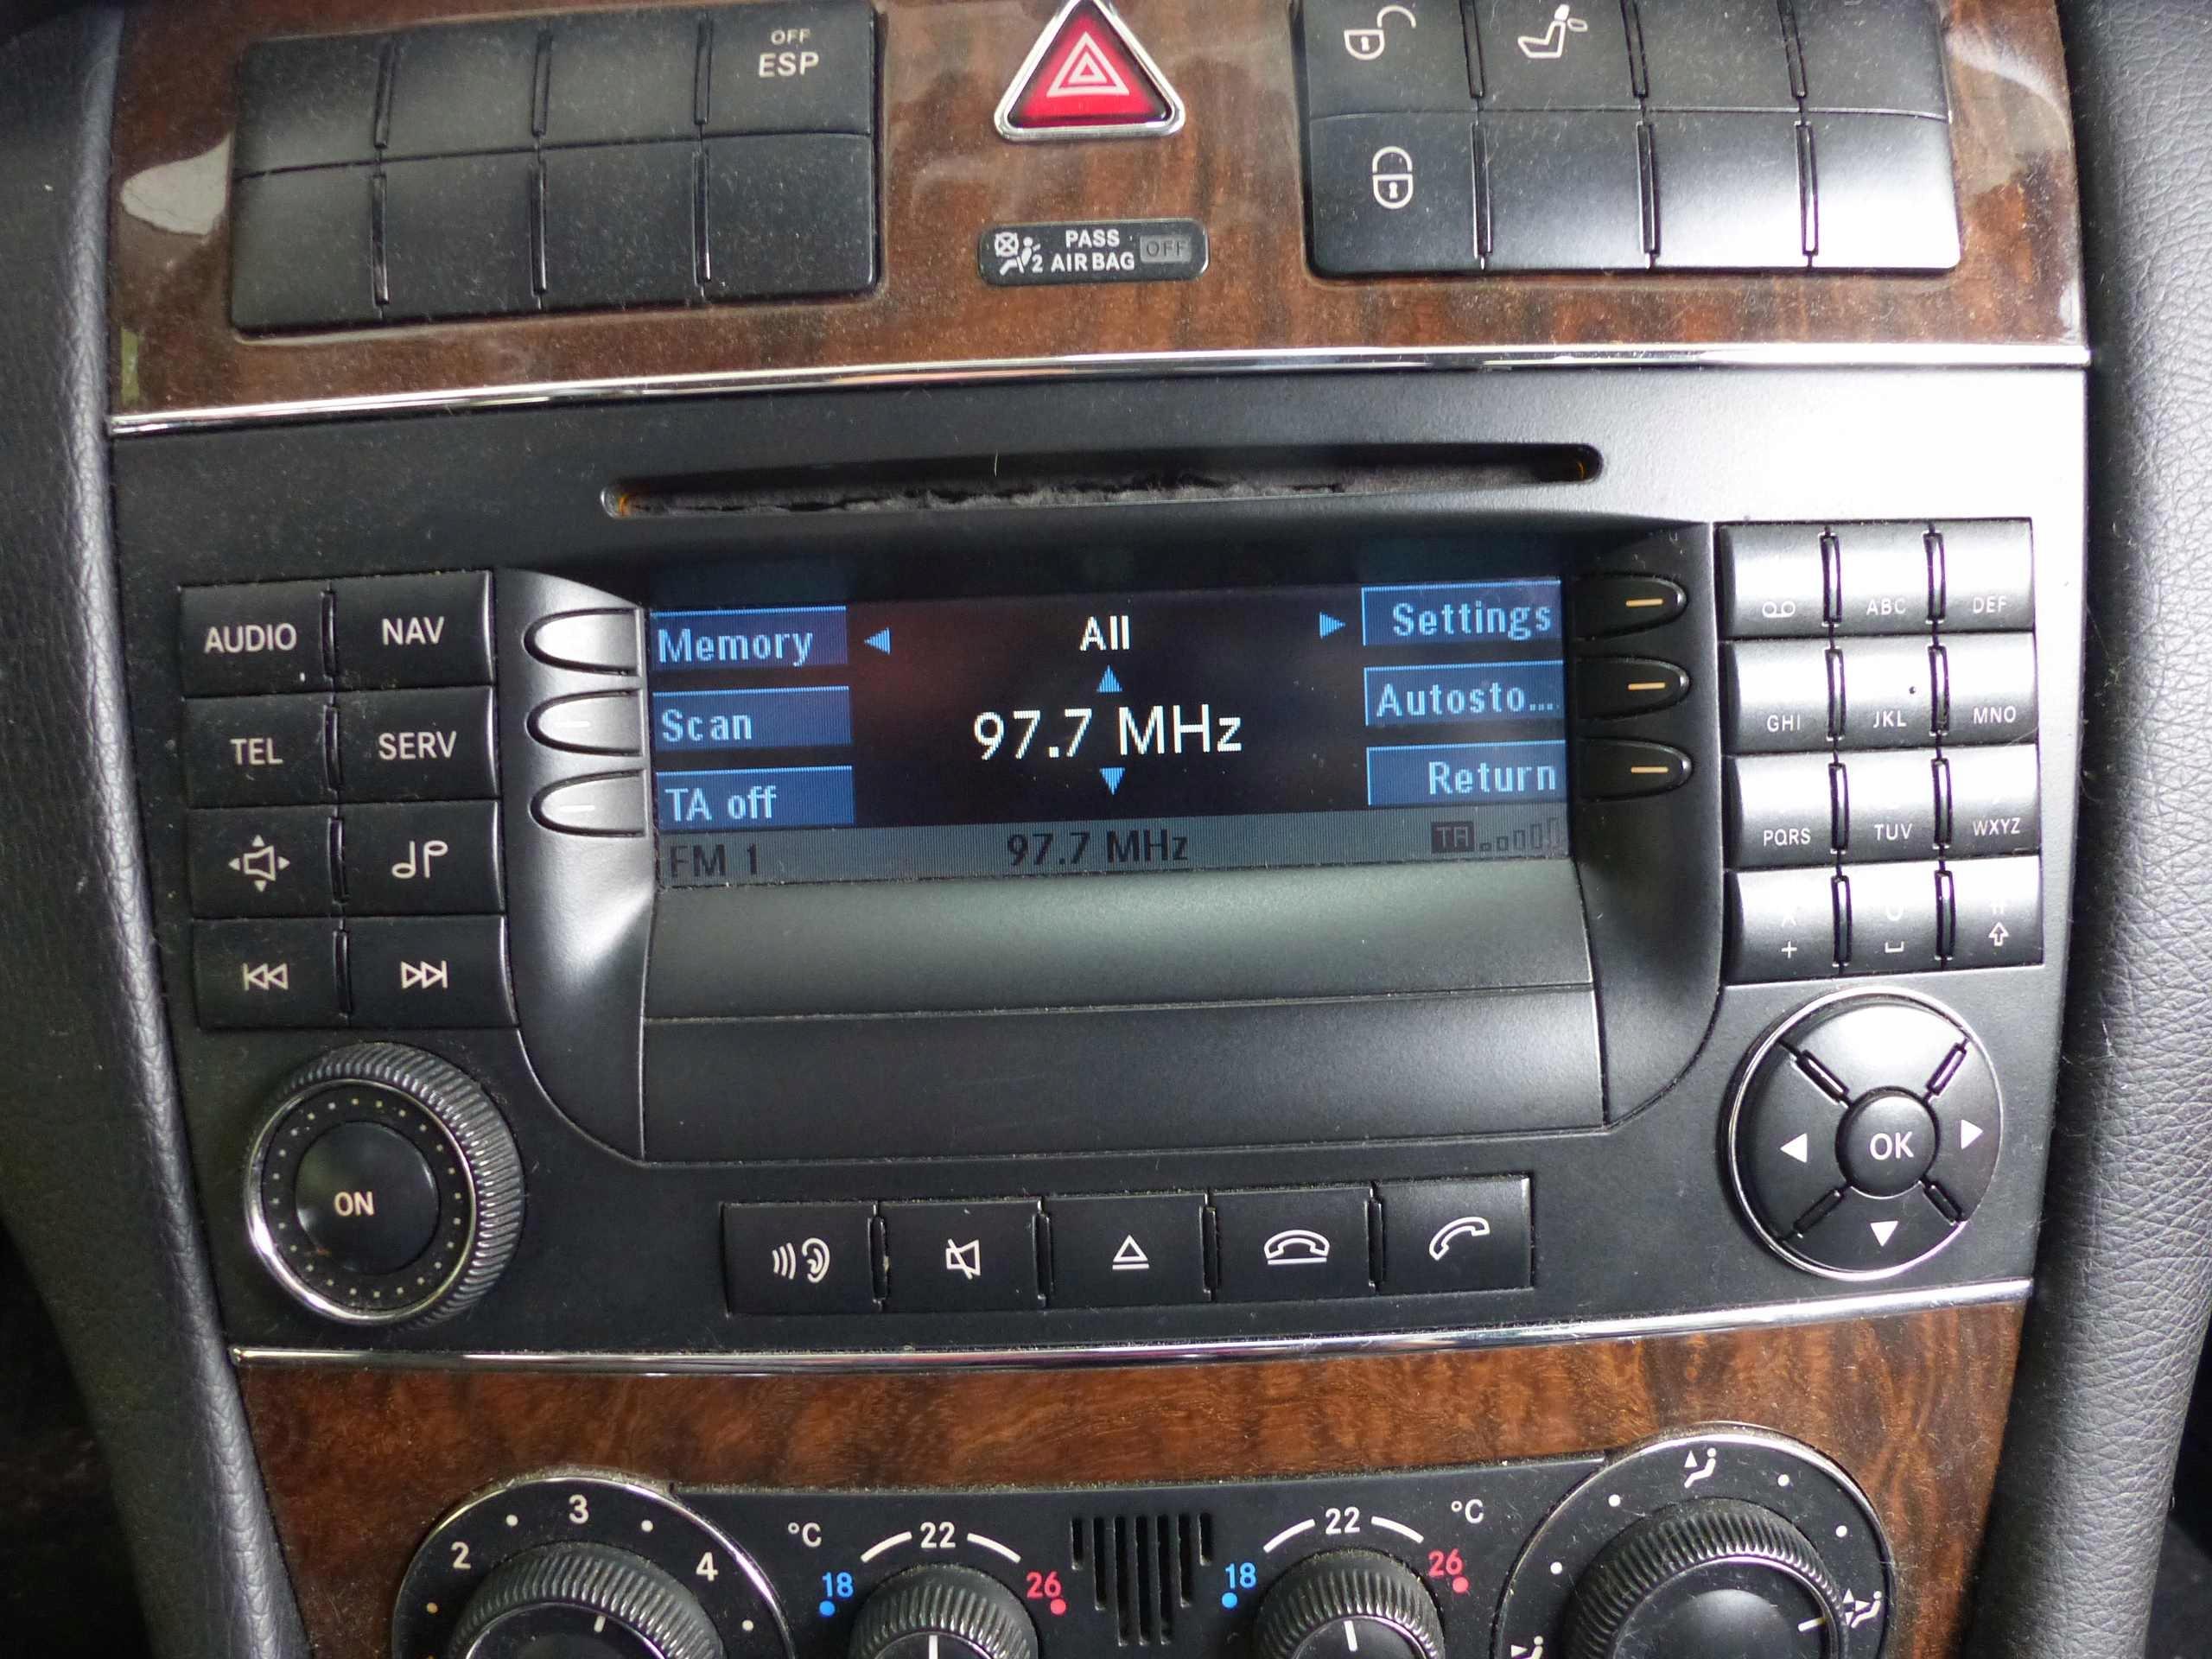 радио navi mercedes w203 00-07 a2038706189 европа